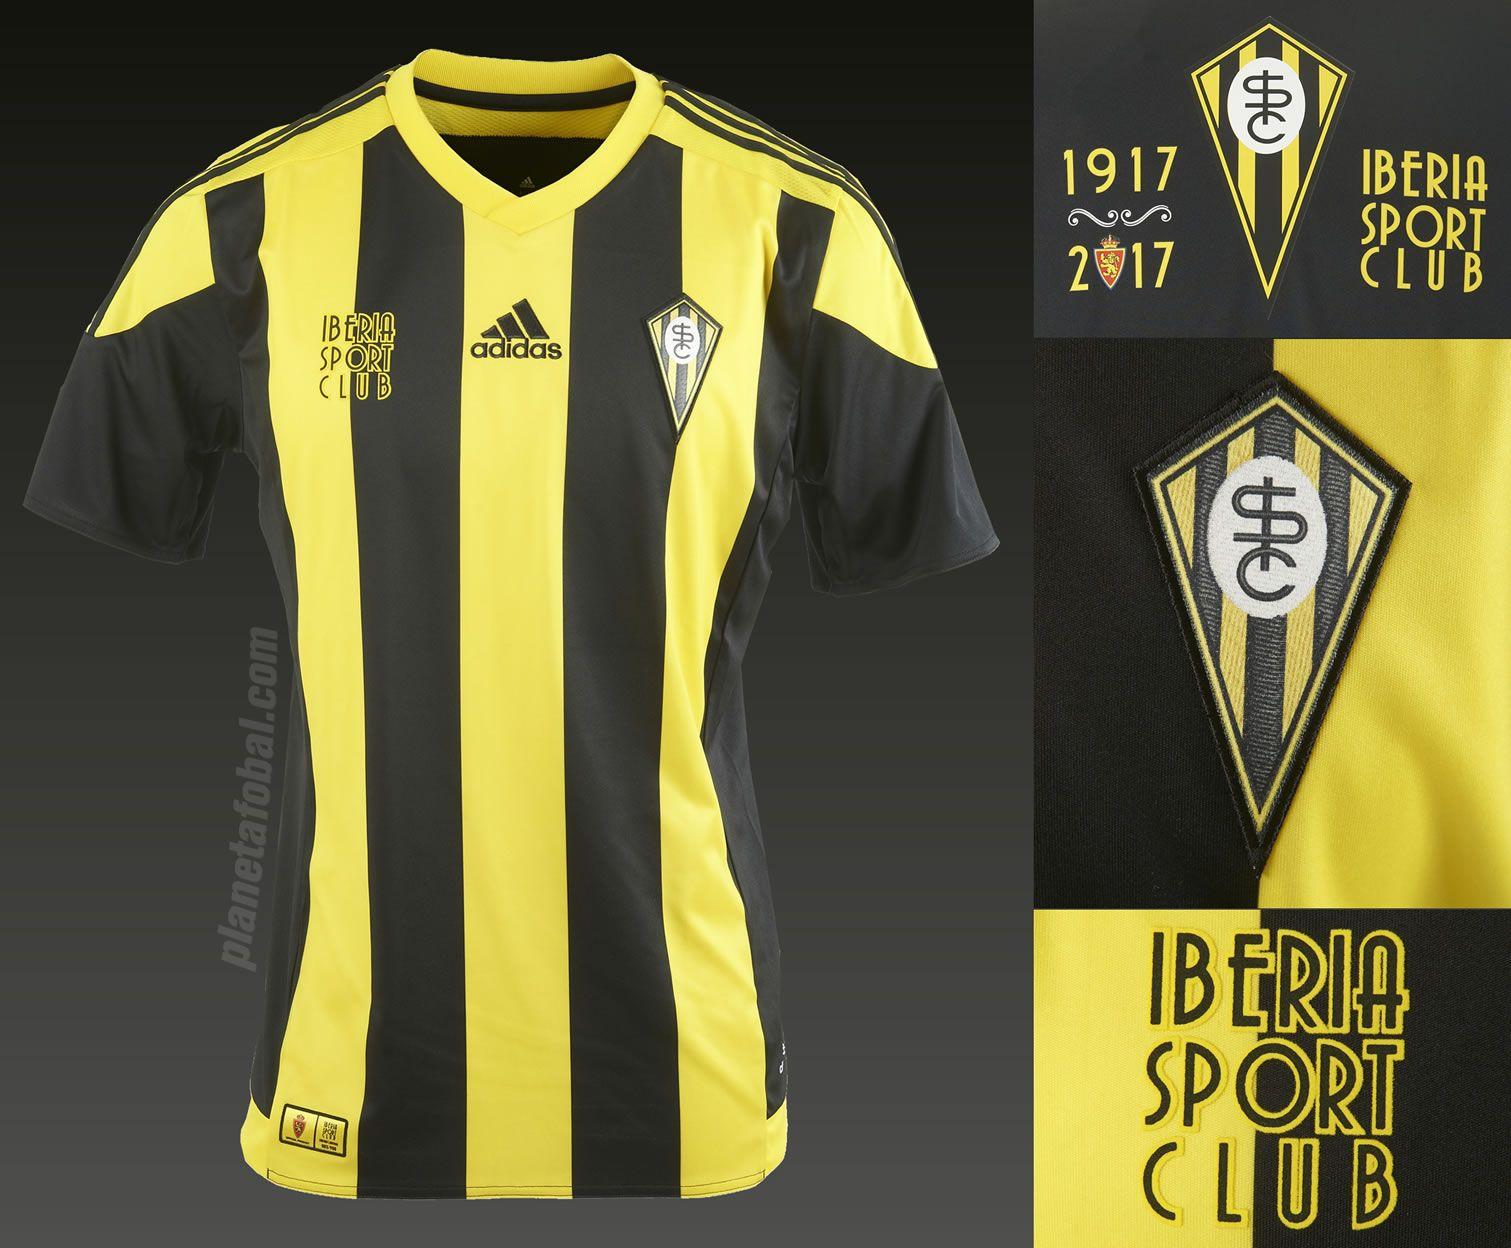 Camiseta especial Iberia Sport Club  f77a93f92f69f